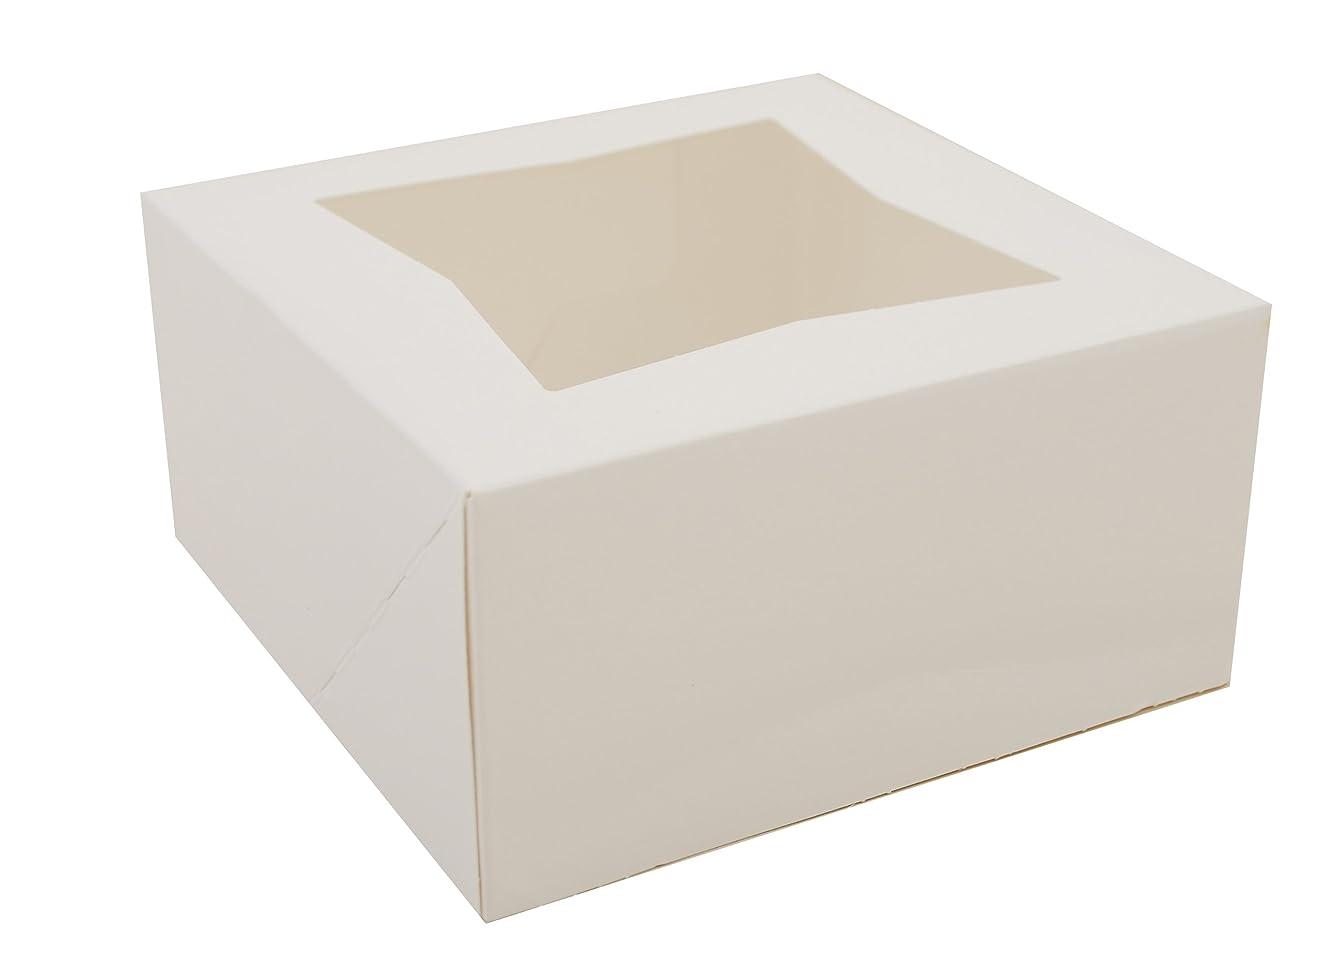 Southern Champion Tray 24023 Paperboard White Window Bakery Box, 6